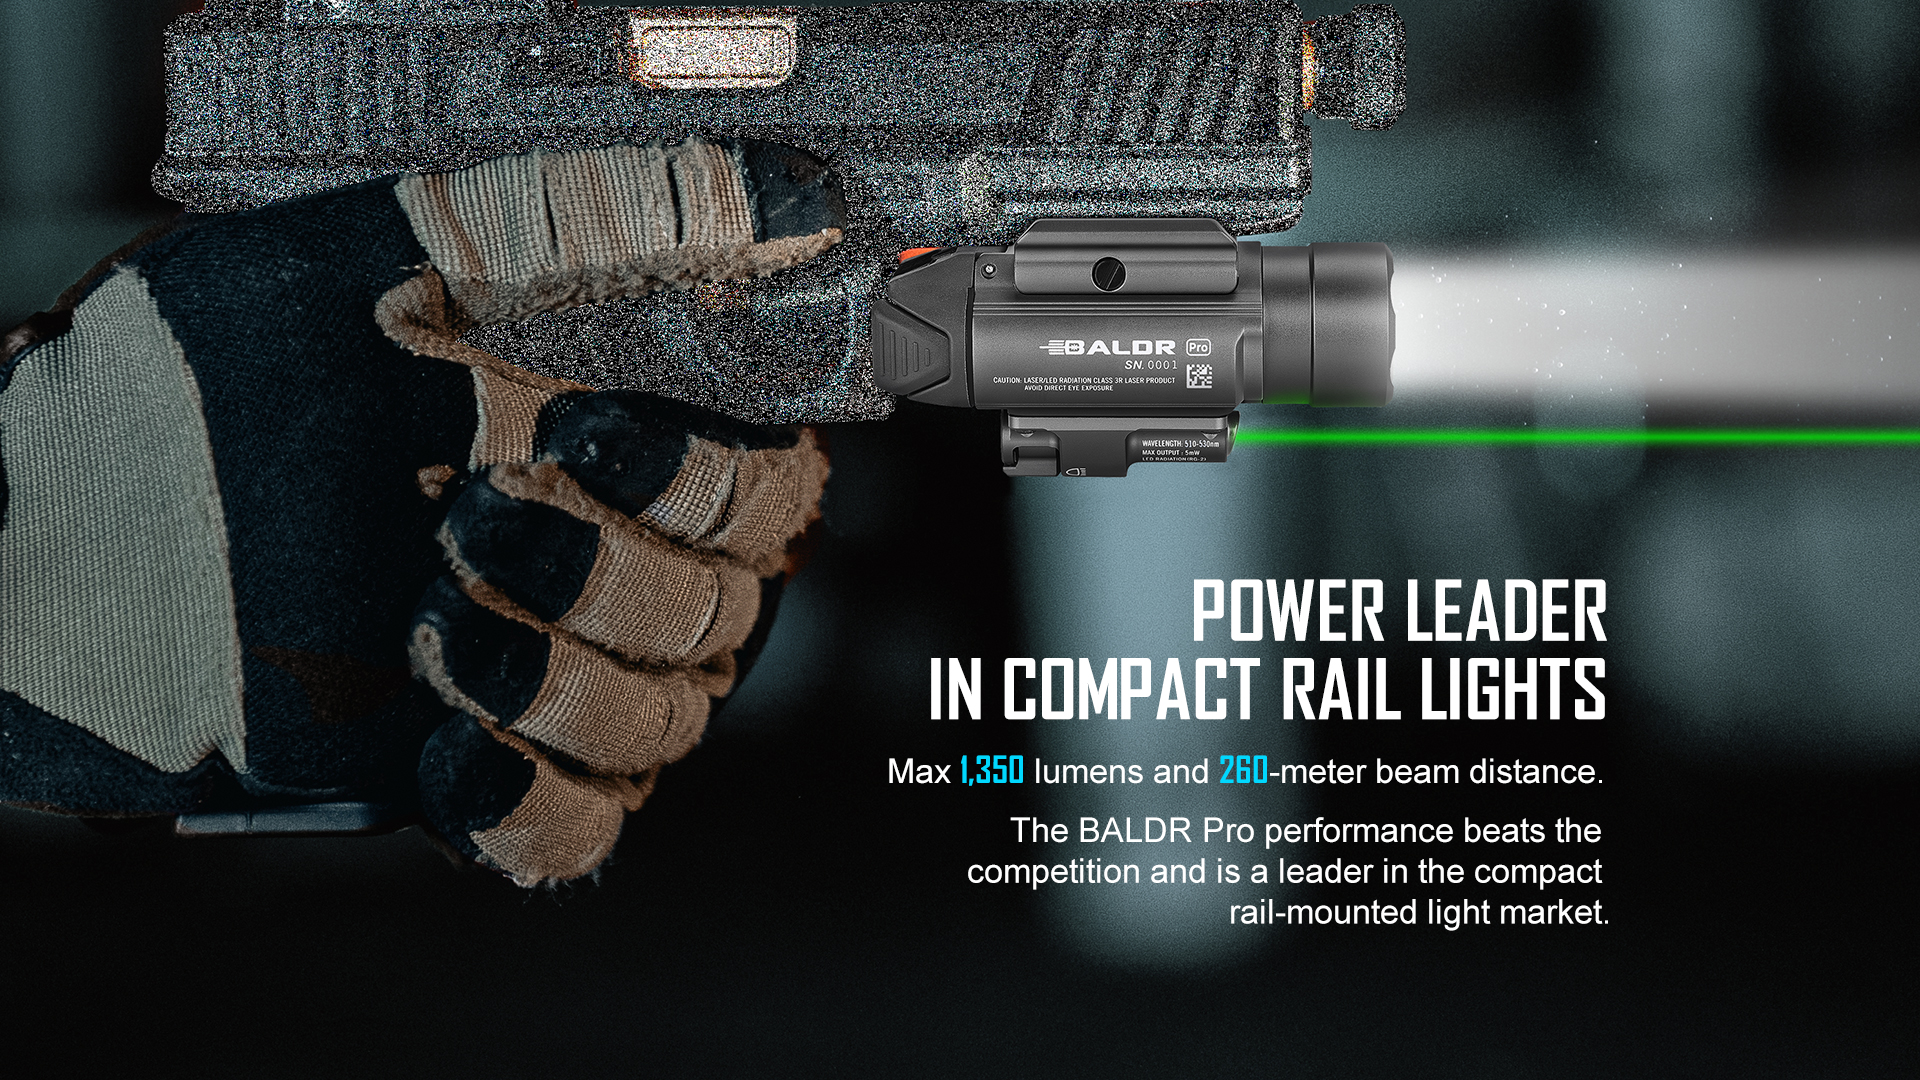 Olight Baldr Pro Green Laser Tactical Light Super Bright